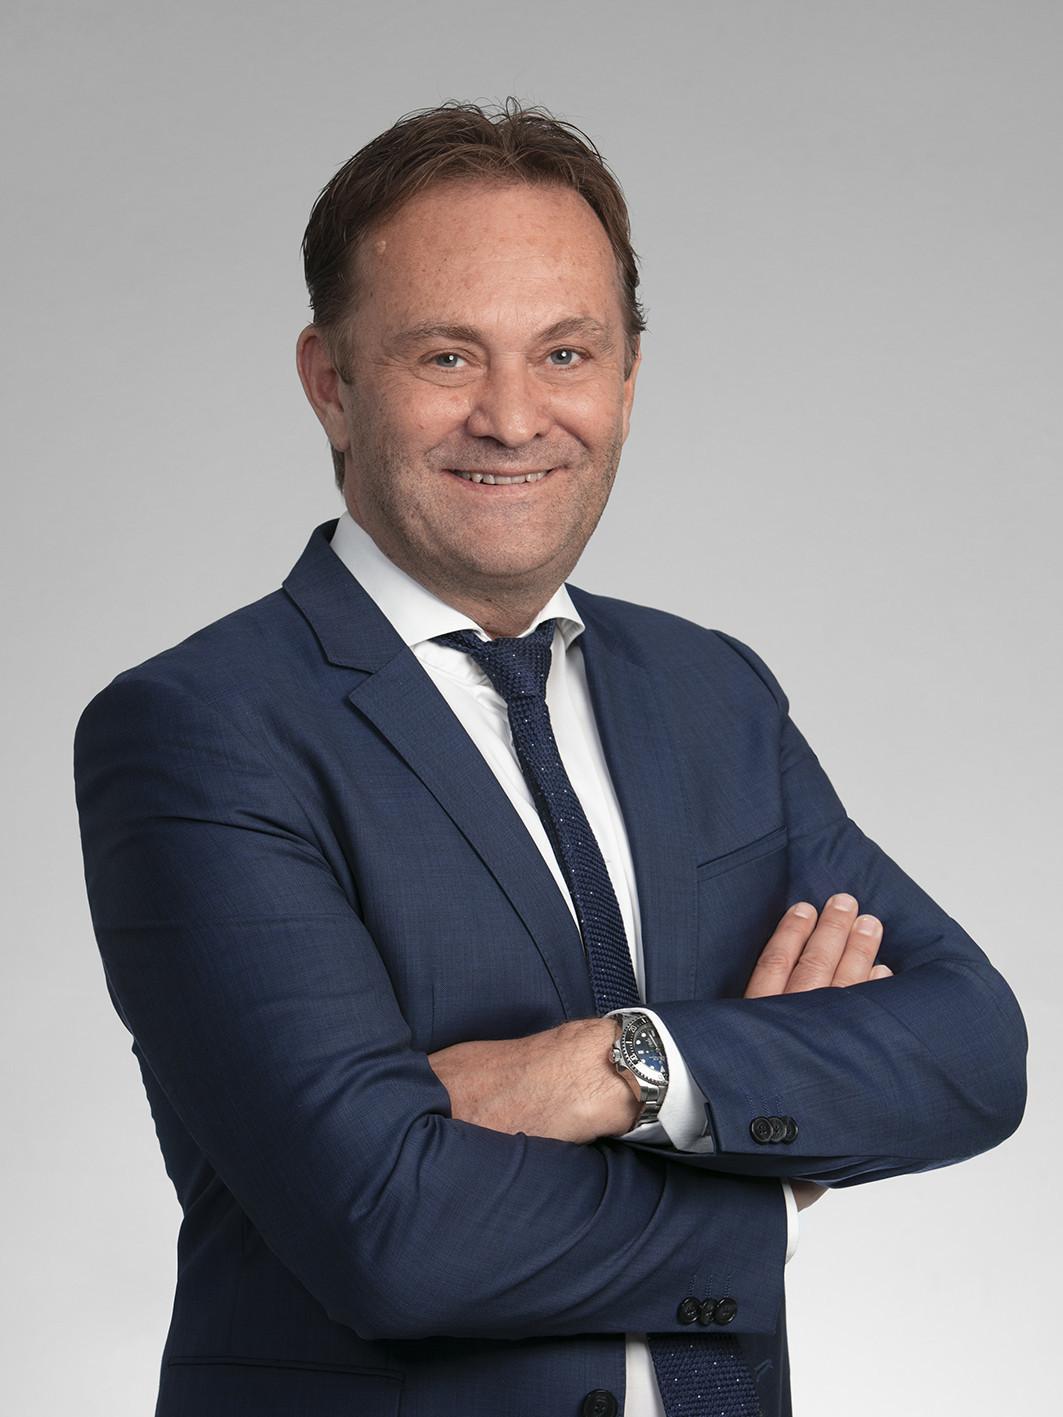 Henrik Bach Nielsen has served as the Danish Ice Hockey Association's President since 2007 ©Henrik Bach Nielsen